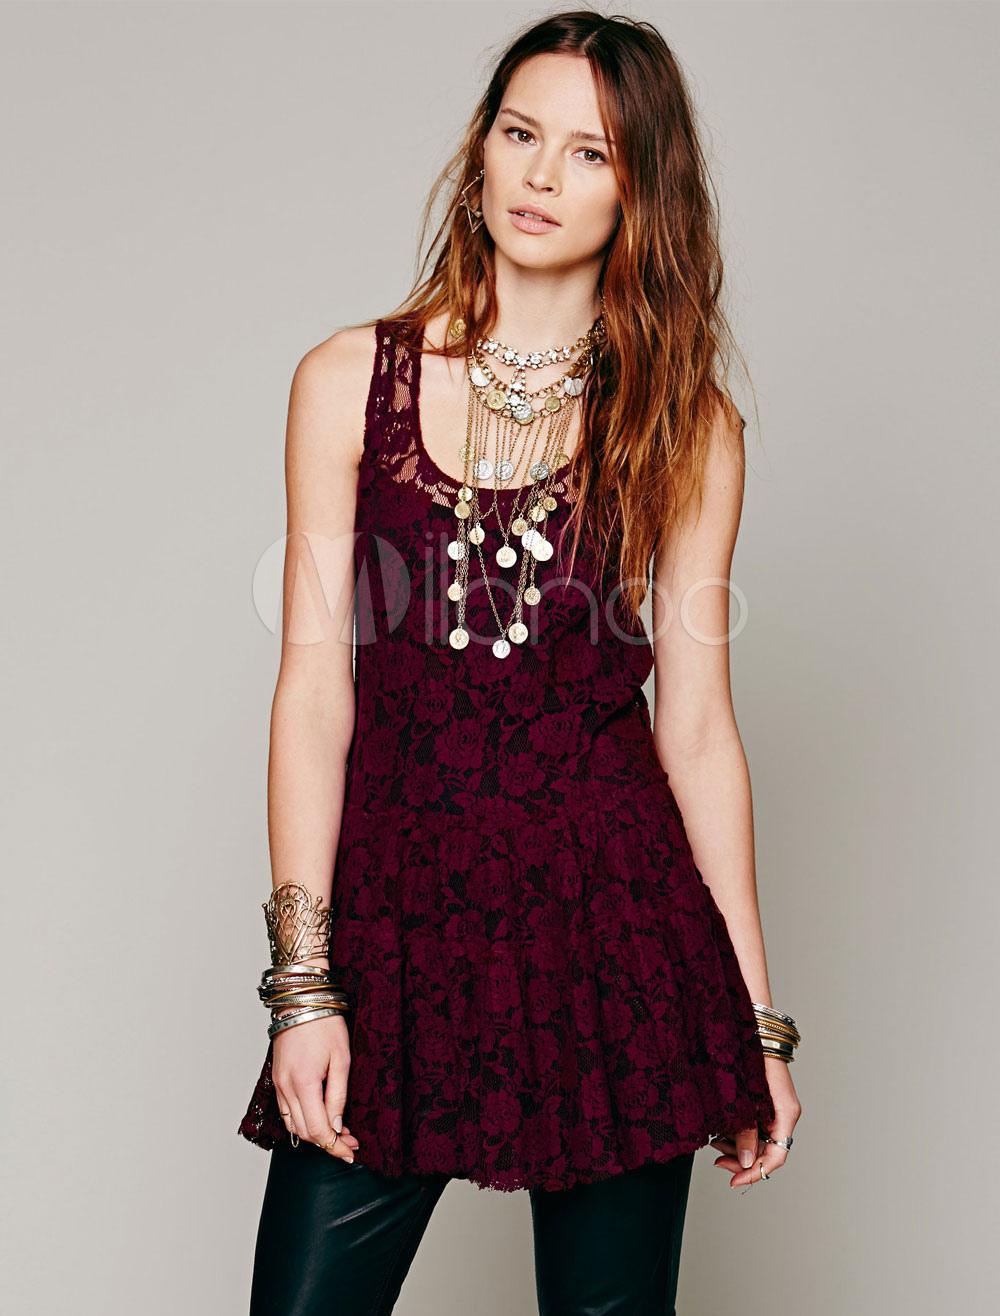 Burgundy Lace Dress Round Neck Sleeveless Semi-Sheer Short Dress For Women (Women\\'s Clothing Lace Dresses) photo